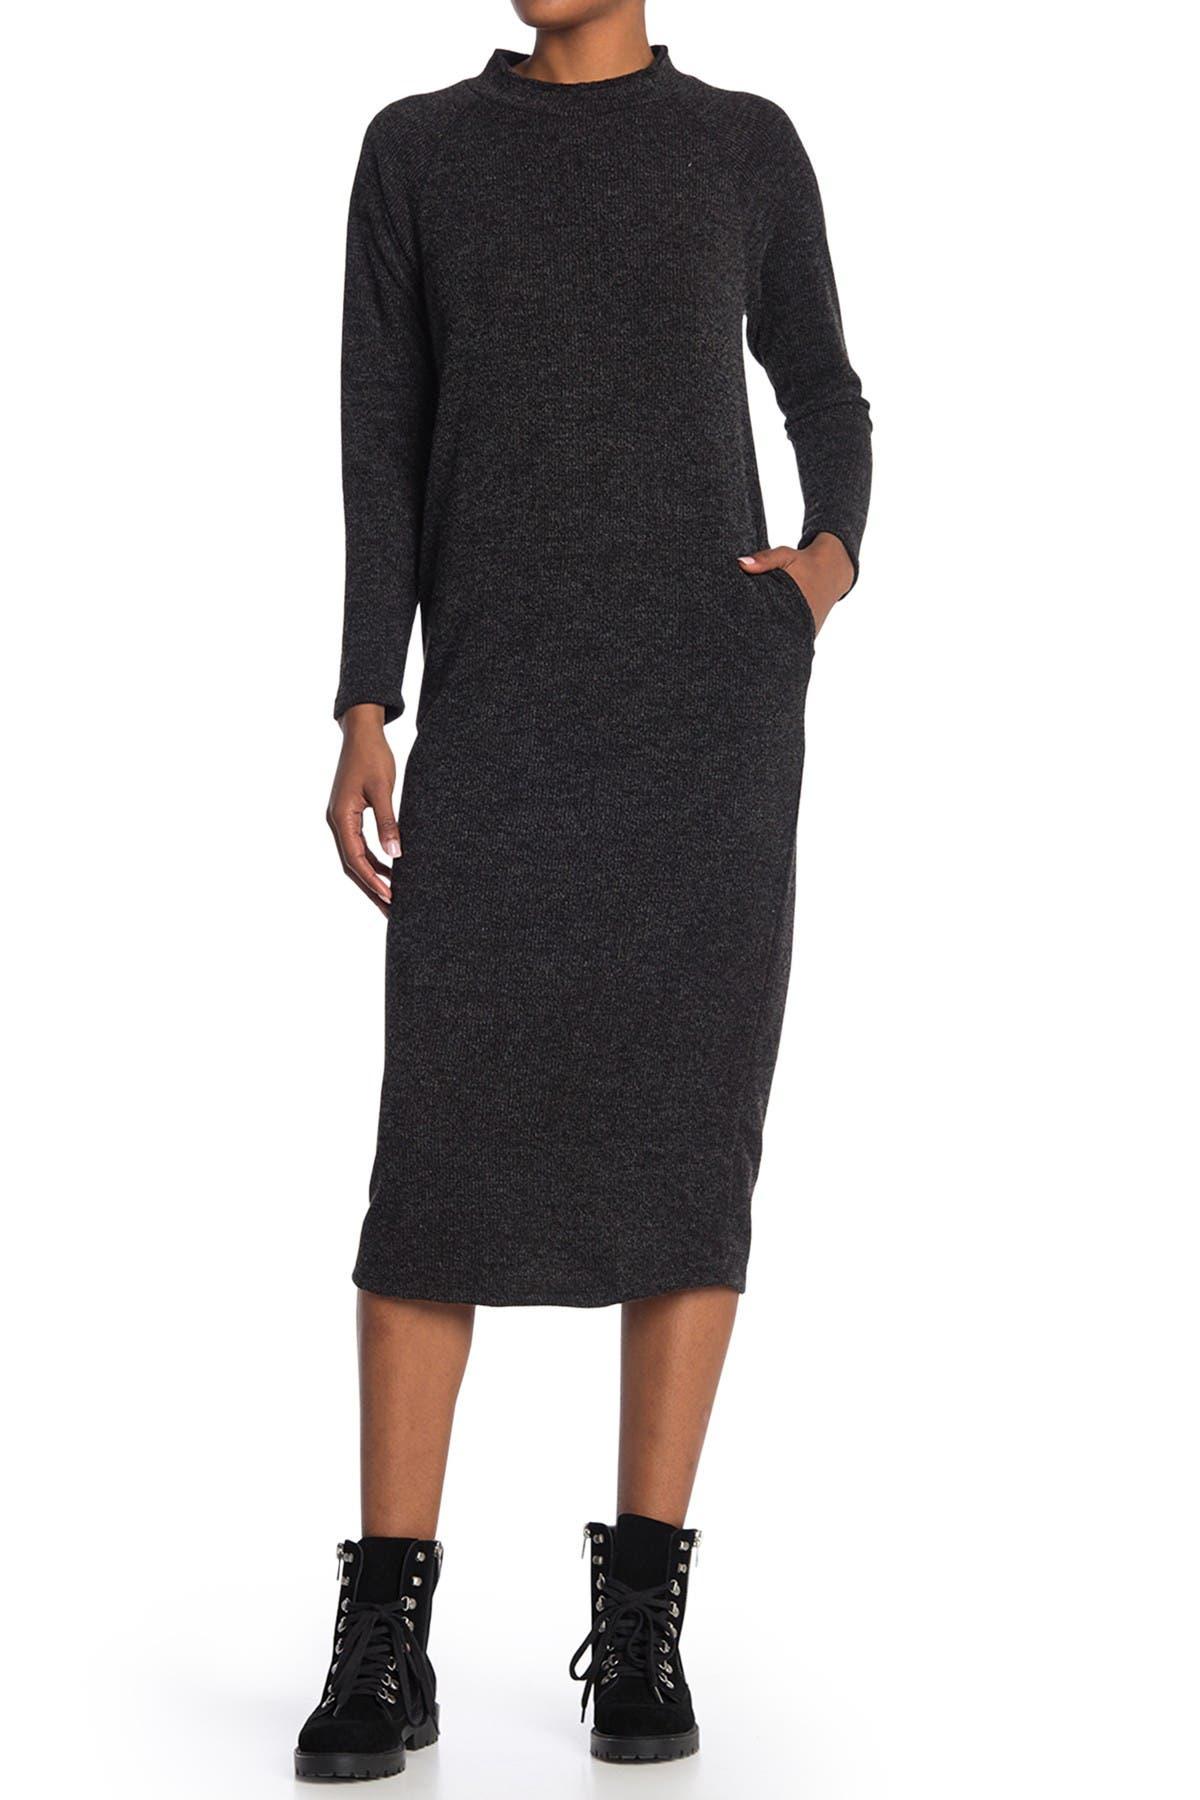 Image of Lush Long Sleeve Knit Dress